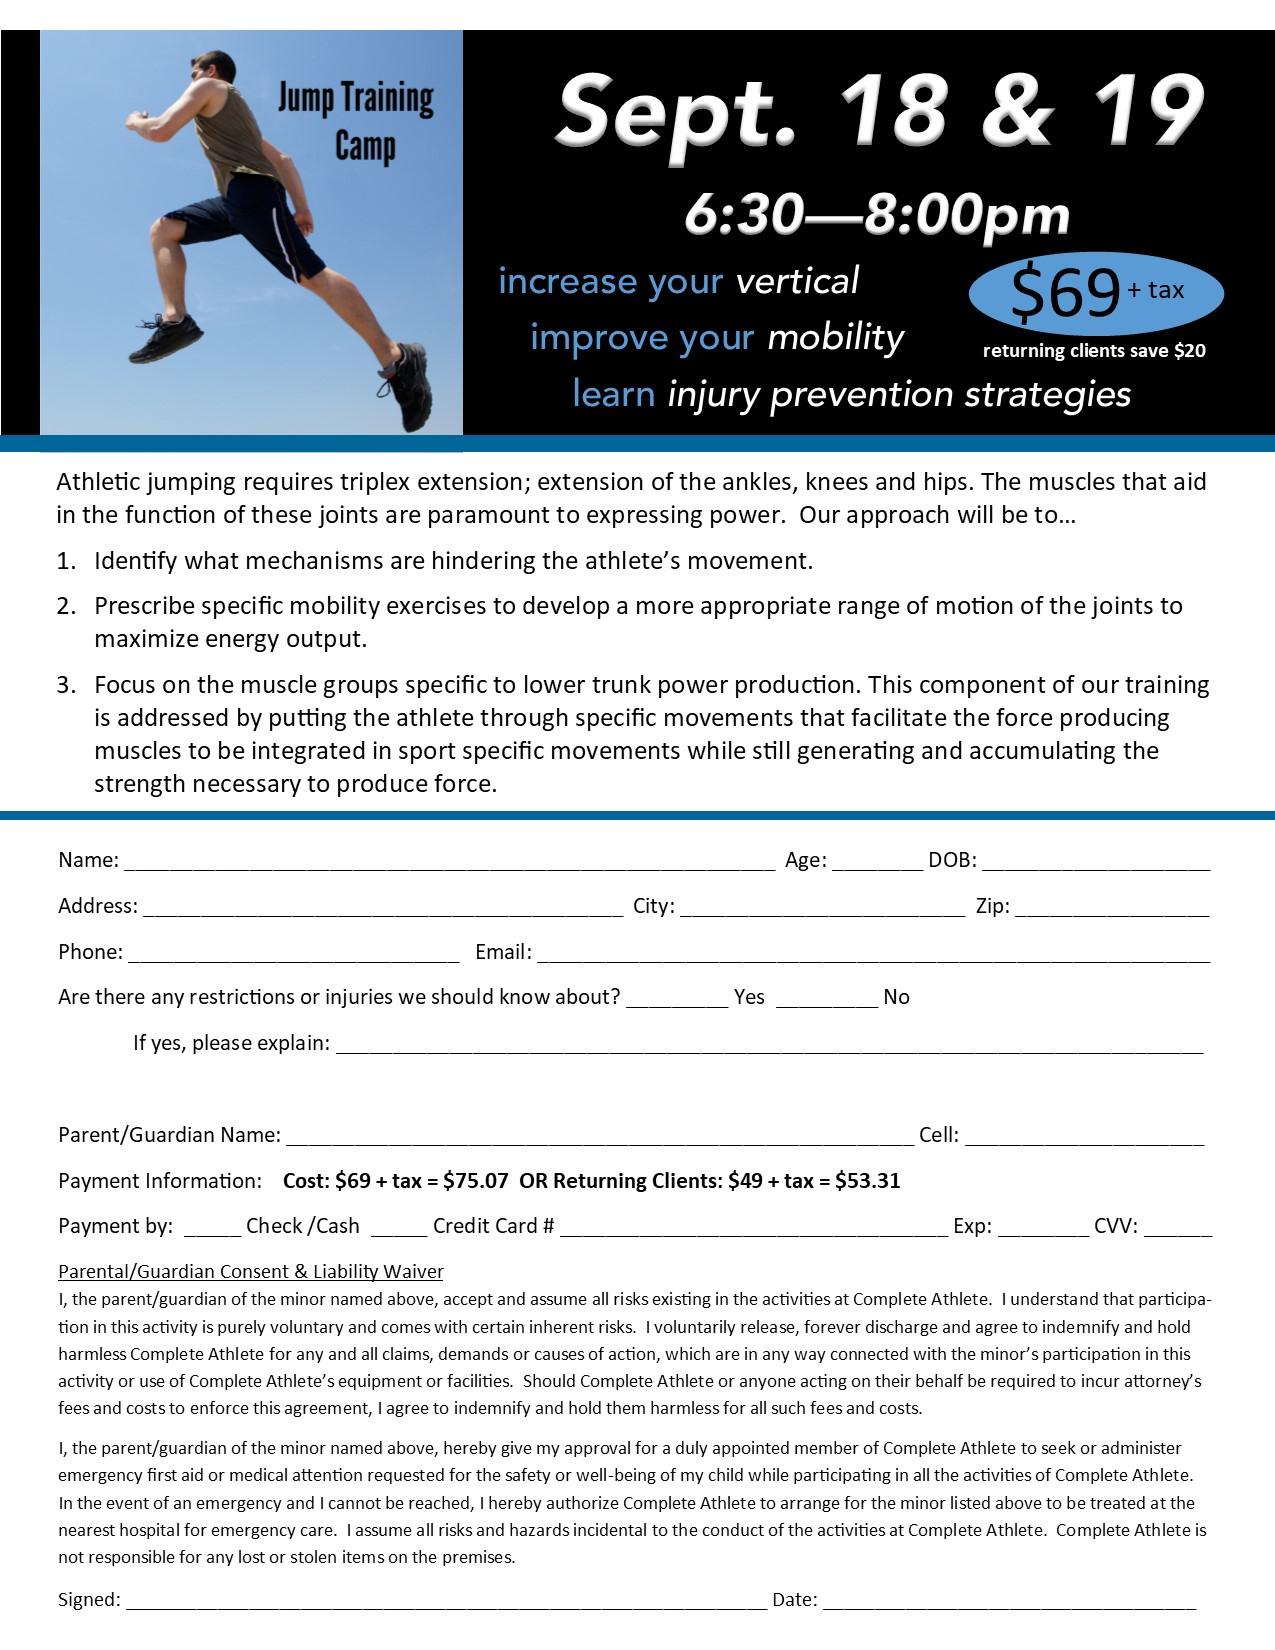 Jump Training Camp Registration Form.jpg